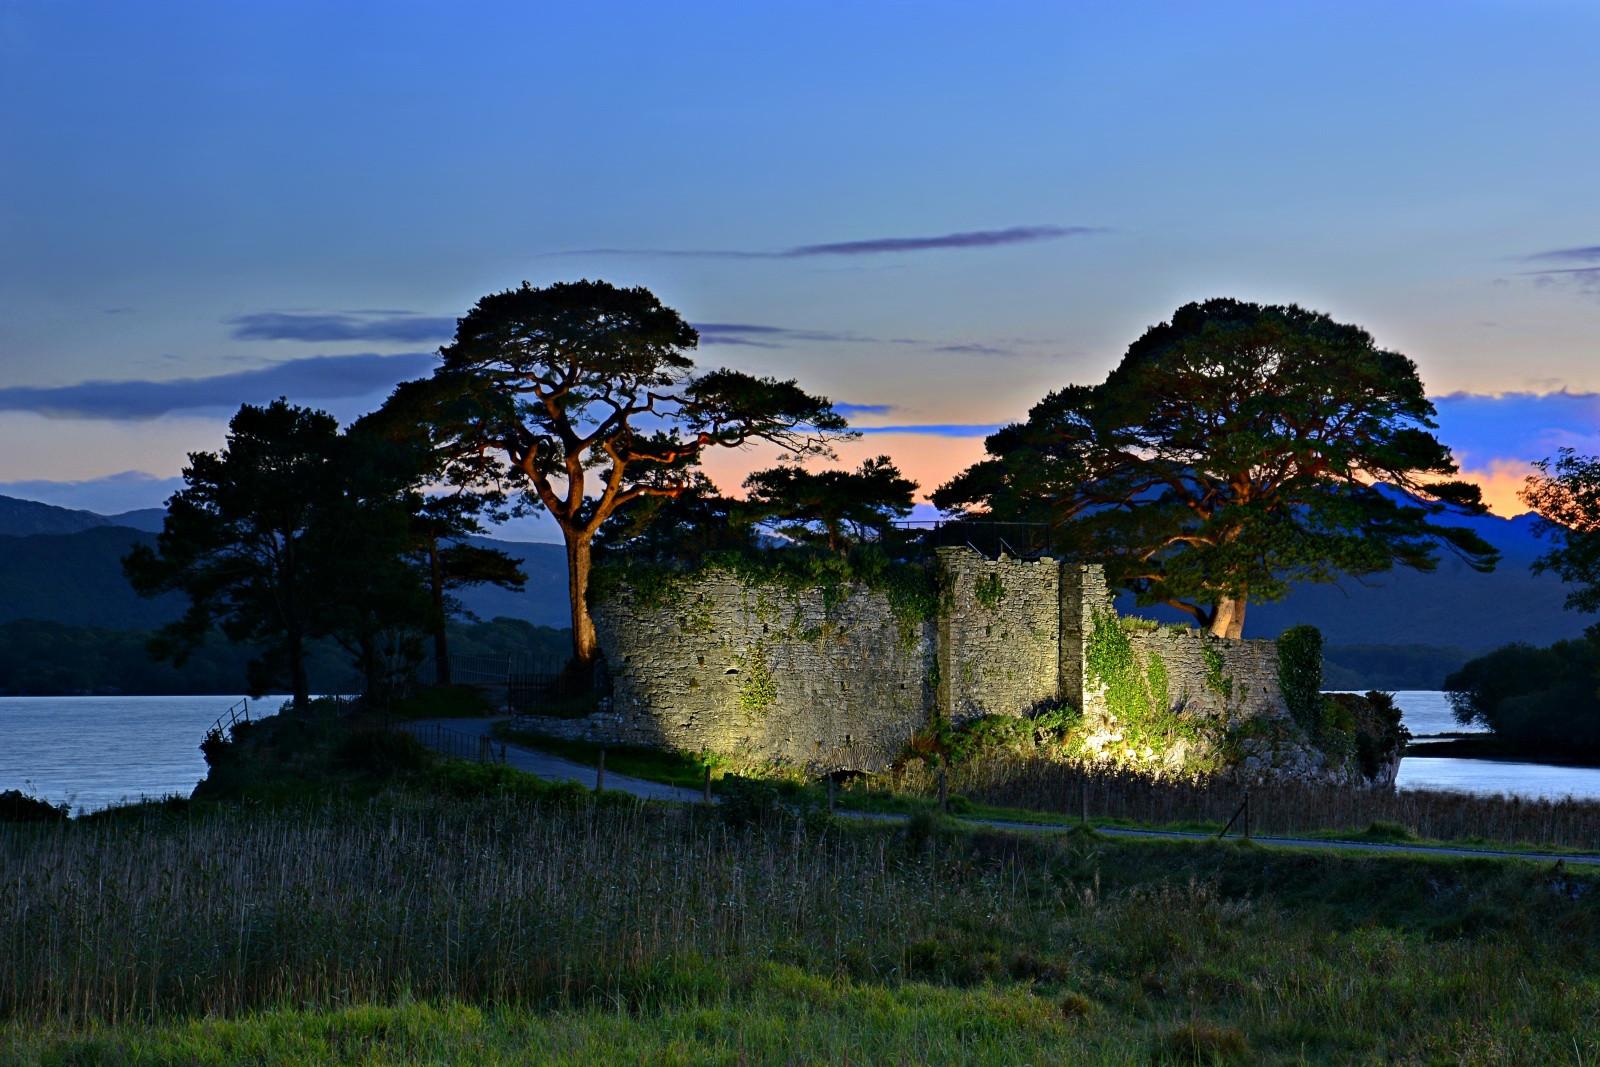 COLOUR - Castle at Dusk by Caroline Johnstone (9 marks)